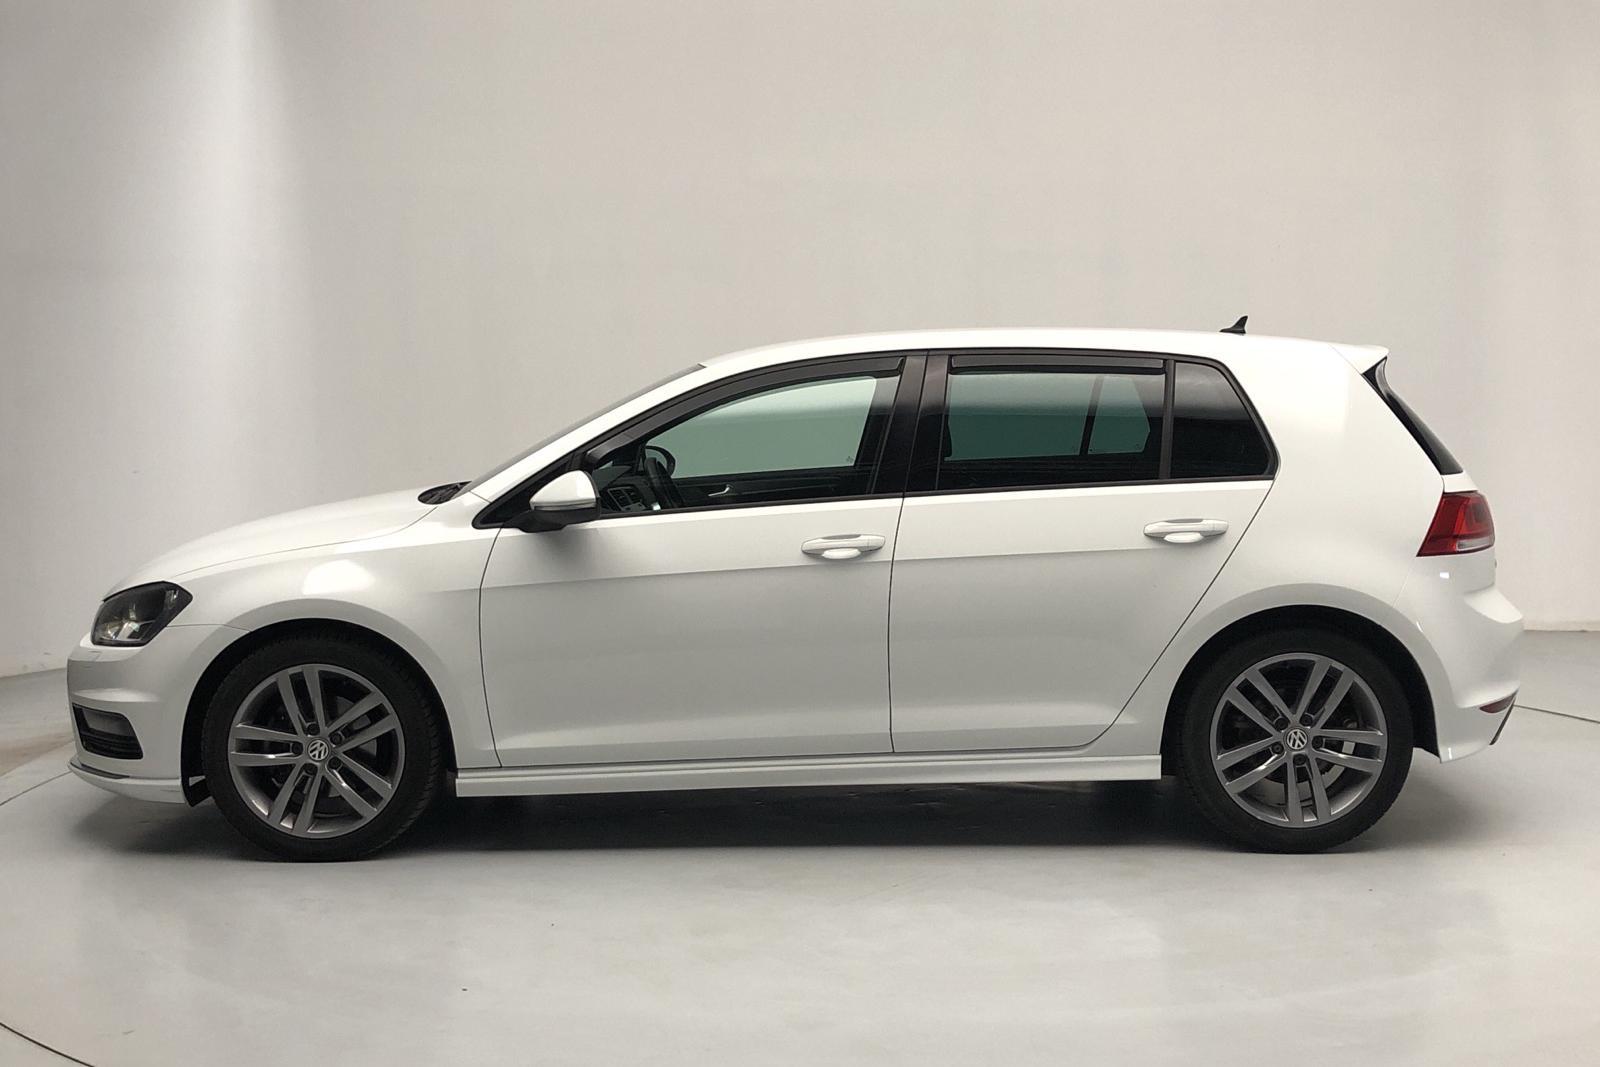 VW Golf VII 1.4 TSI 5dr (150hk) - 5 300 mil - Manuell - vit - 2017